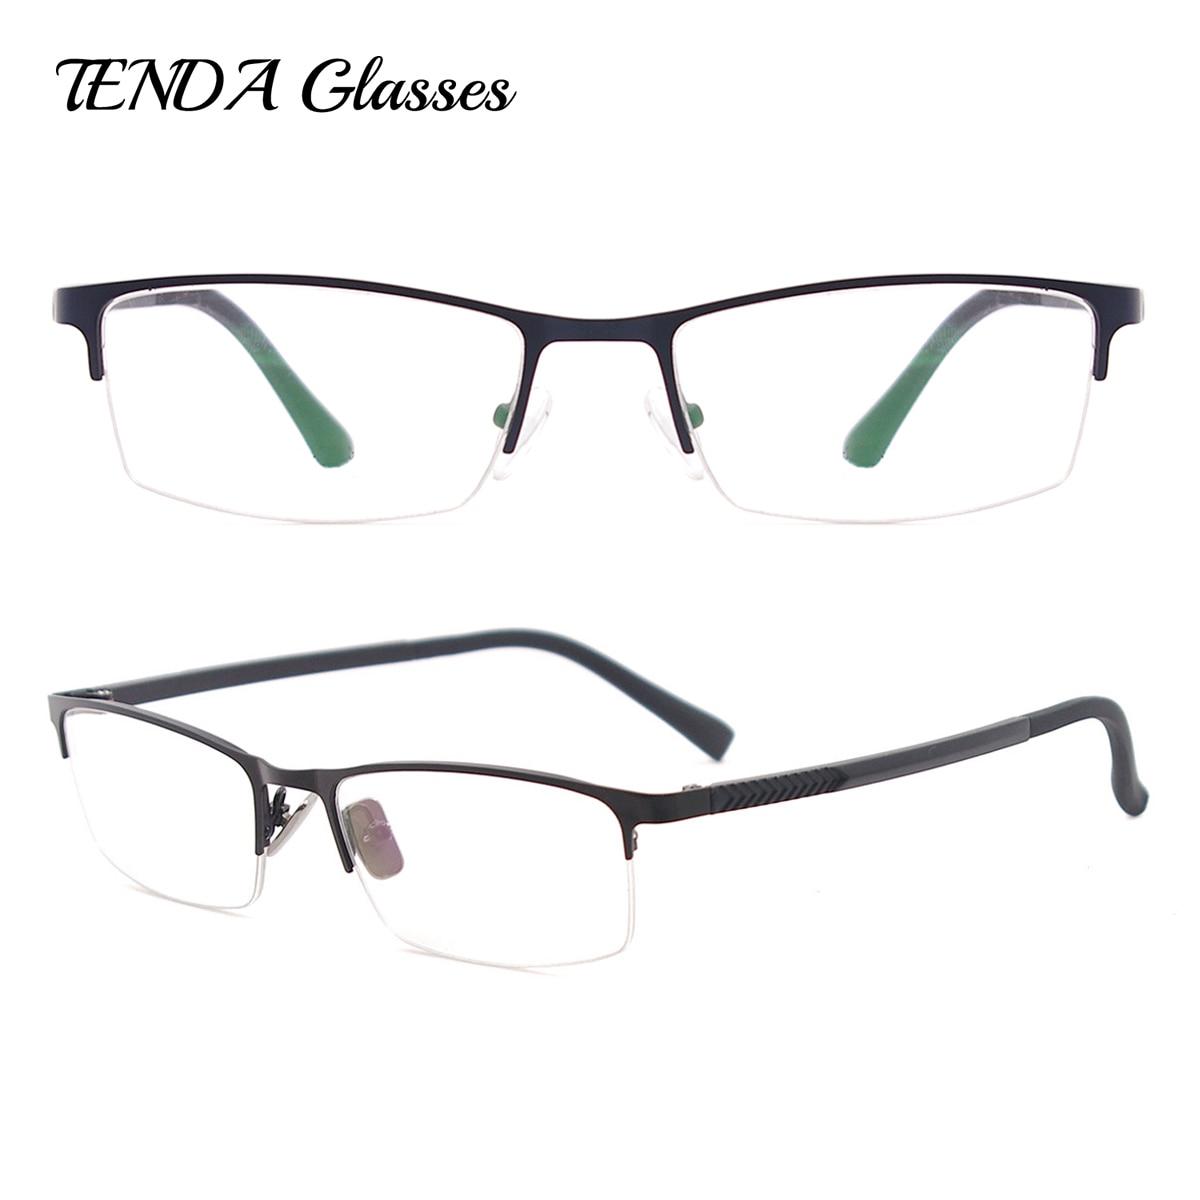 Metal Half Rim Spectacles Men Classic Eyeglass Frame For Myopia & Reading Prescription Lenses